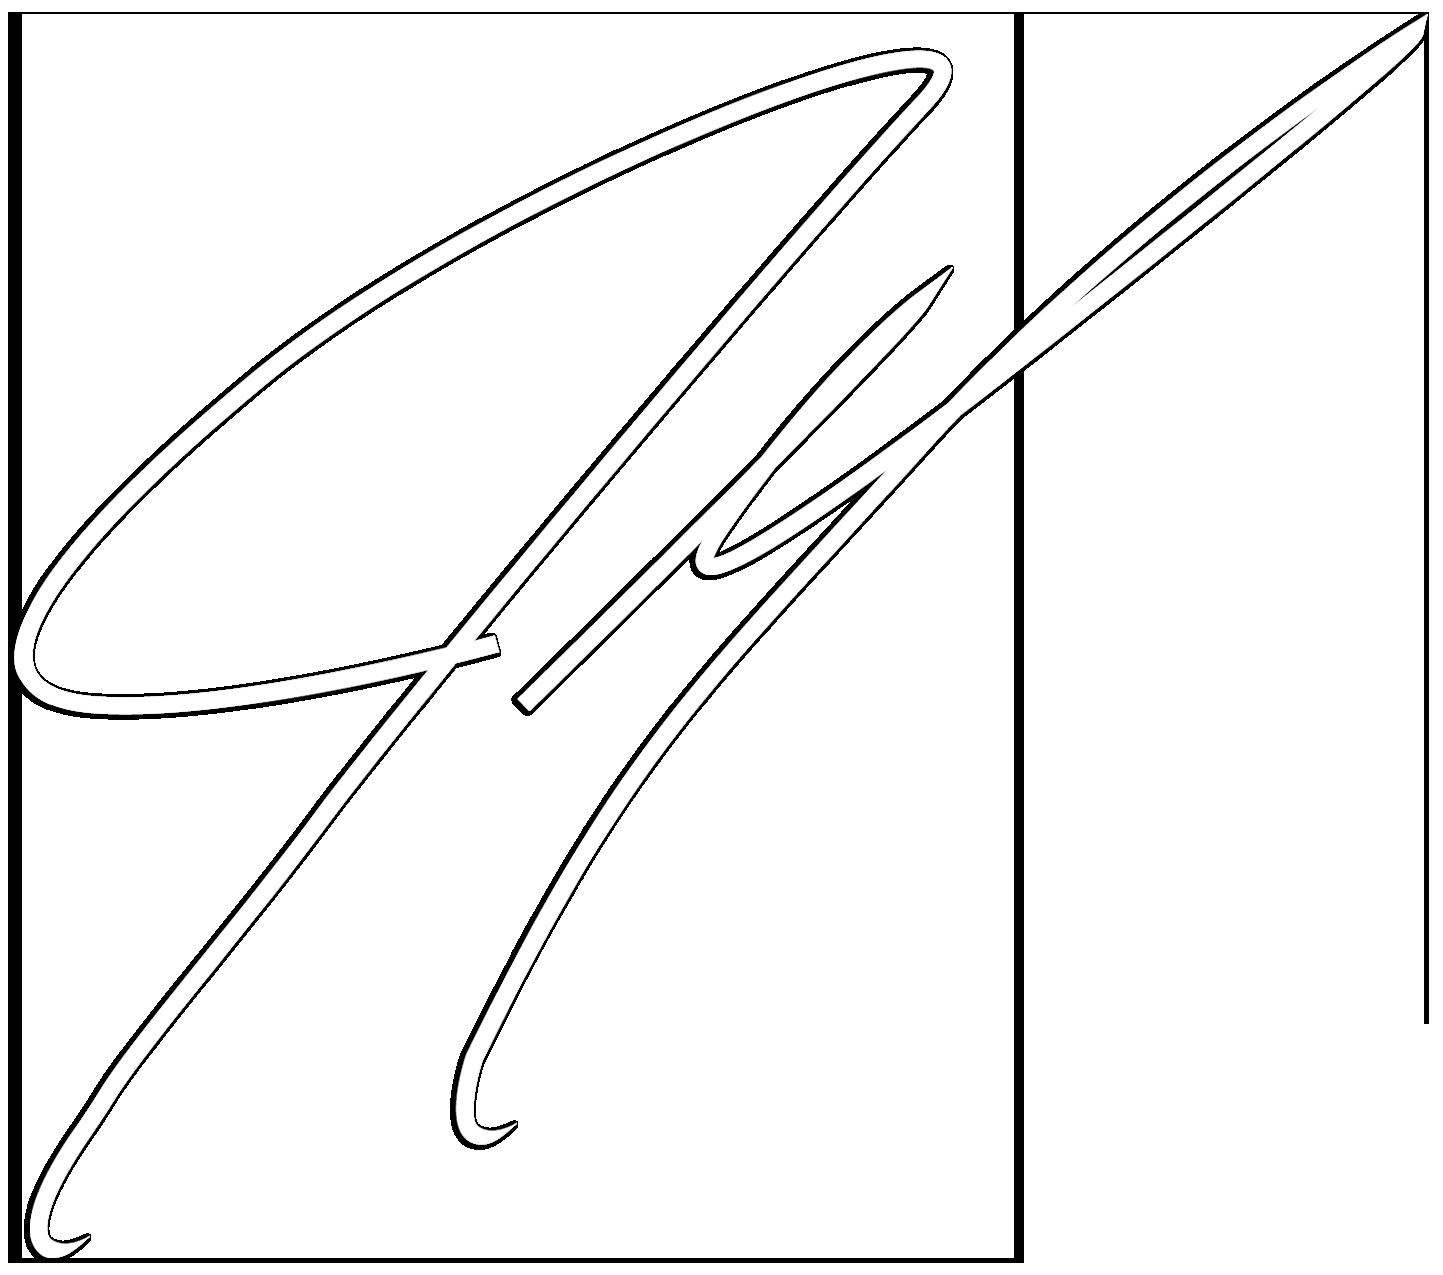 Miceli Law, P.A. logo Initials